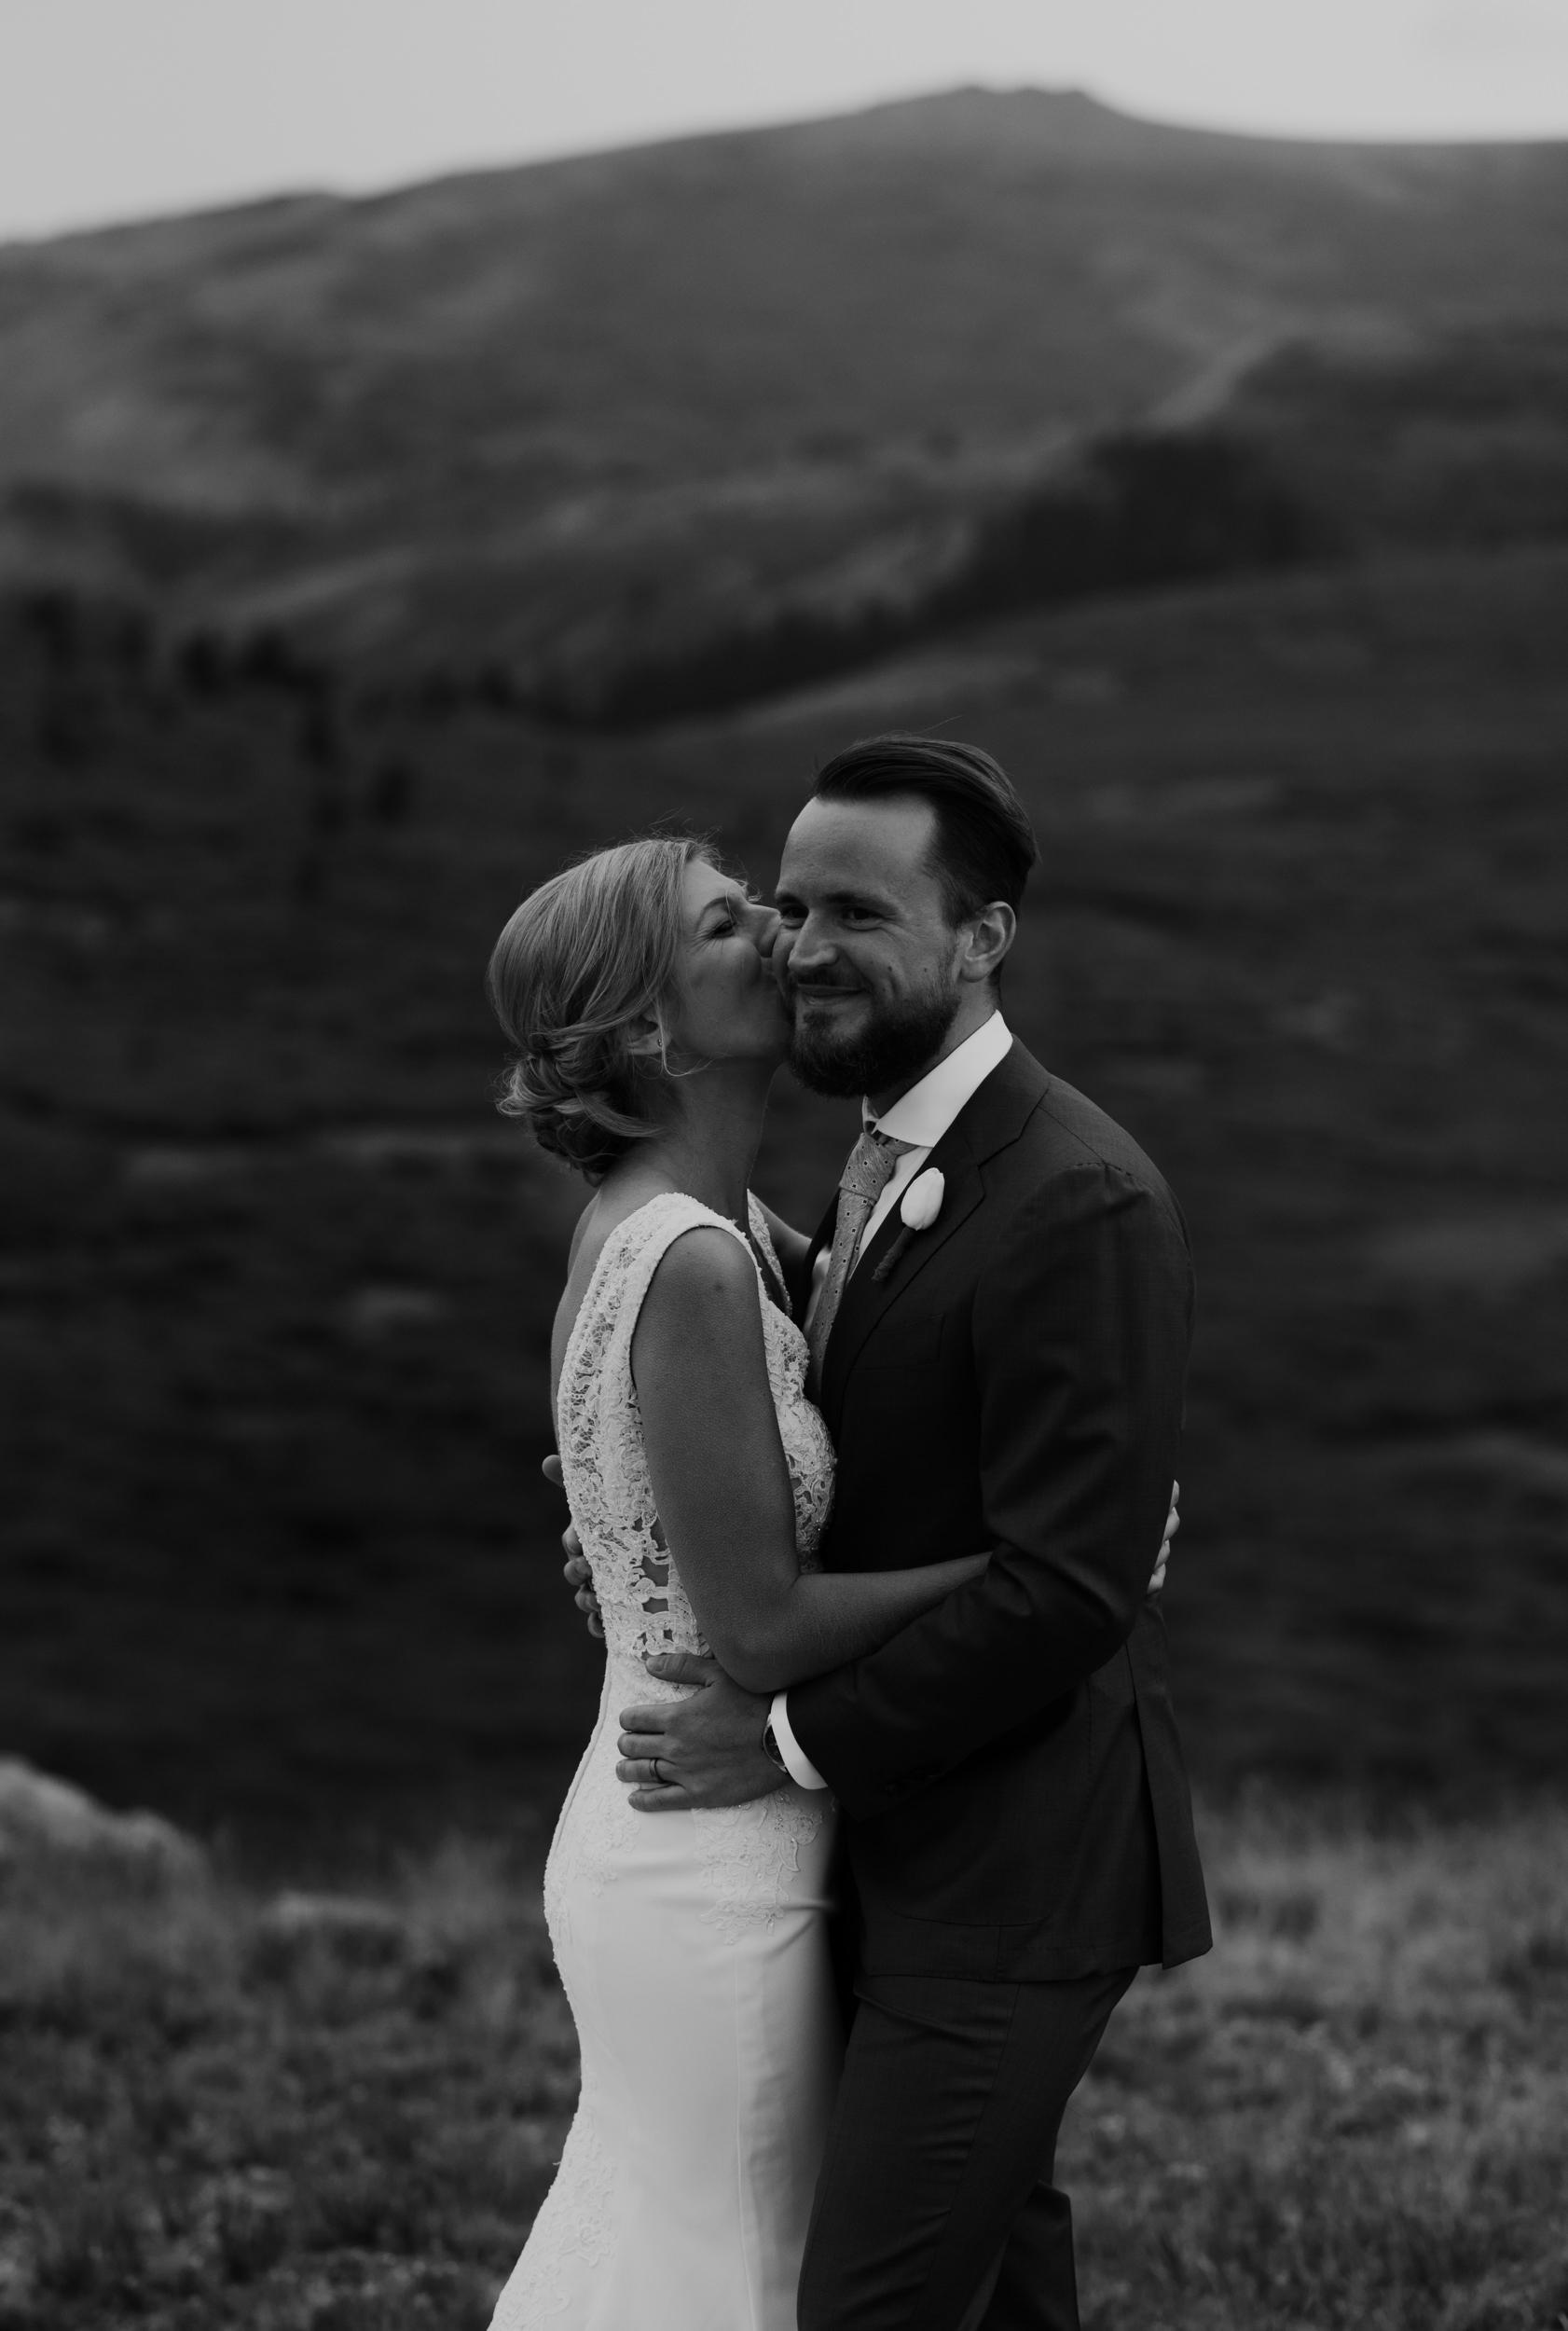 Colorado wedding and elopement photographer. Wedding photo inspiration.